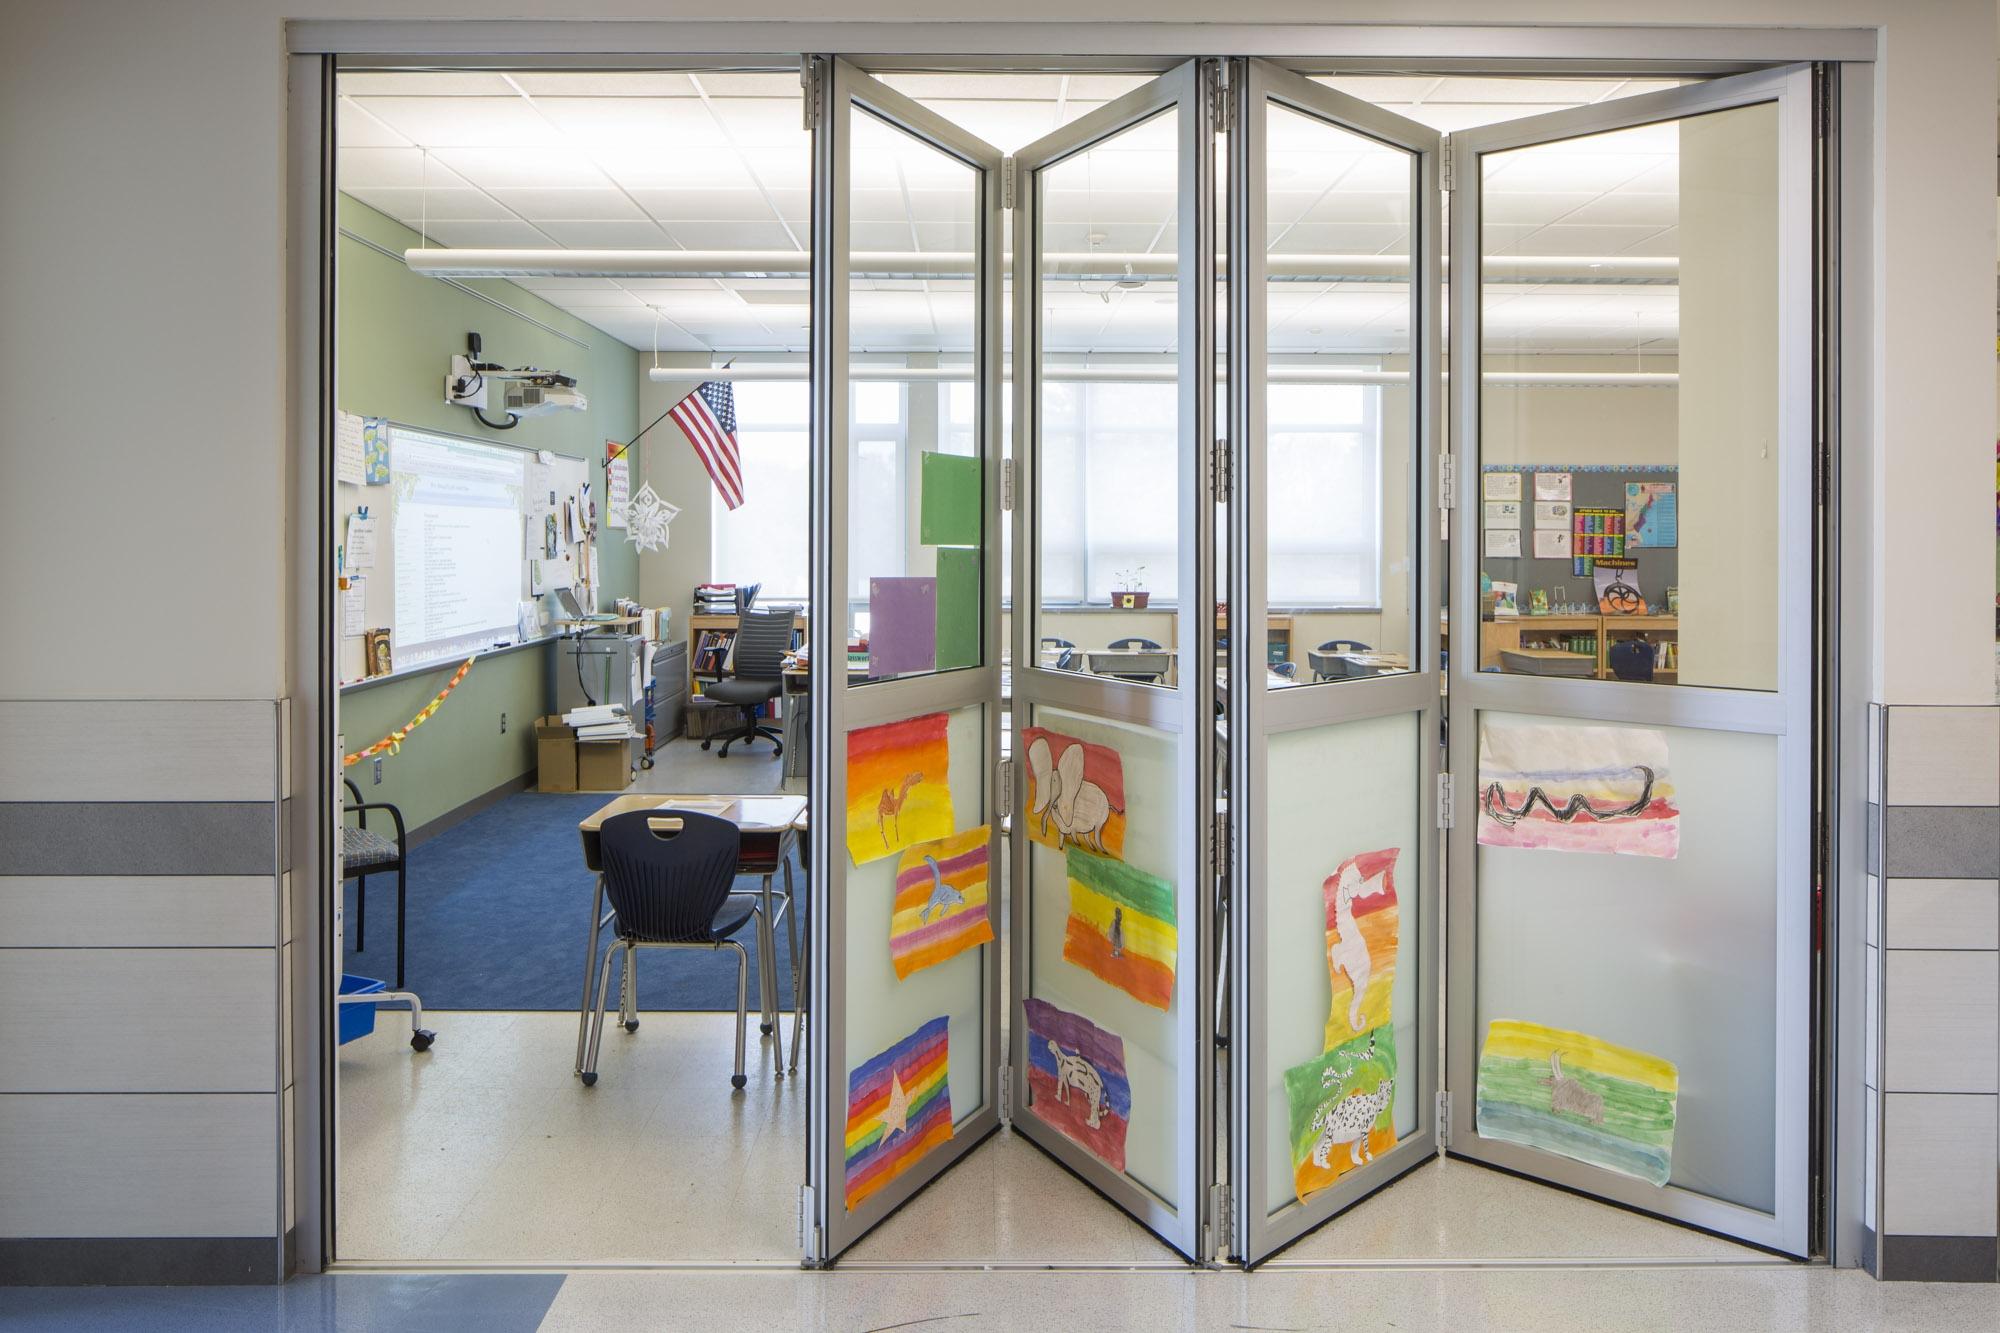 SMMA Classroom Design for Bancroft Elementary